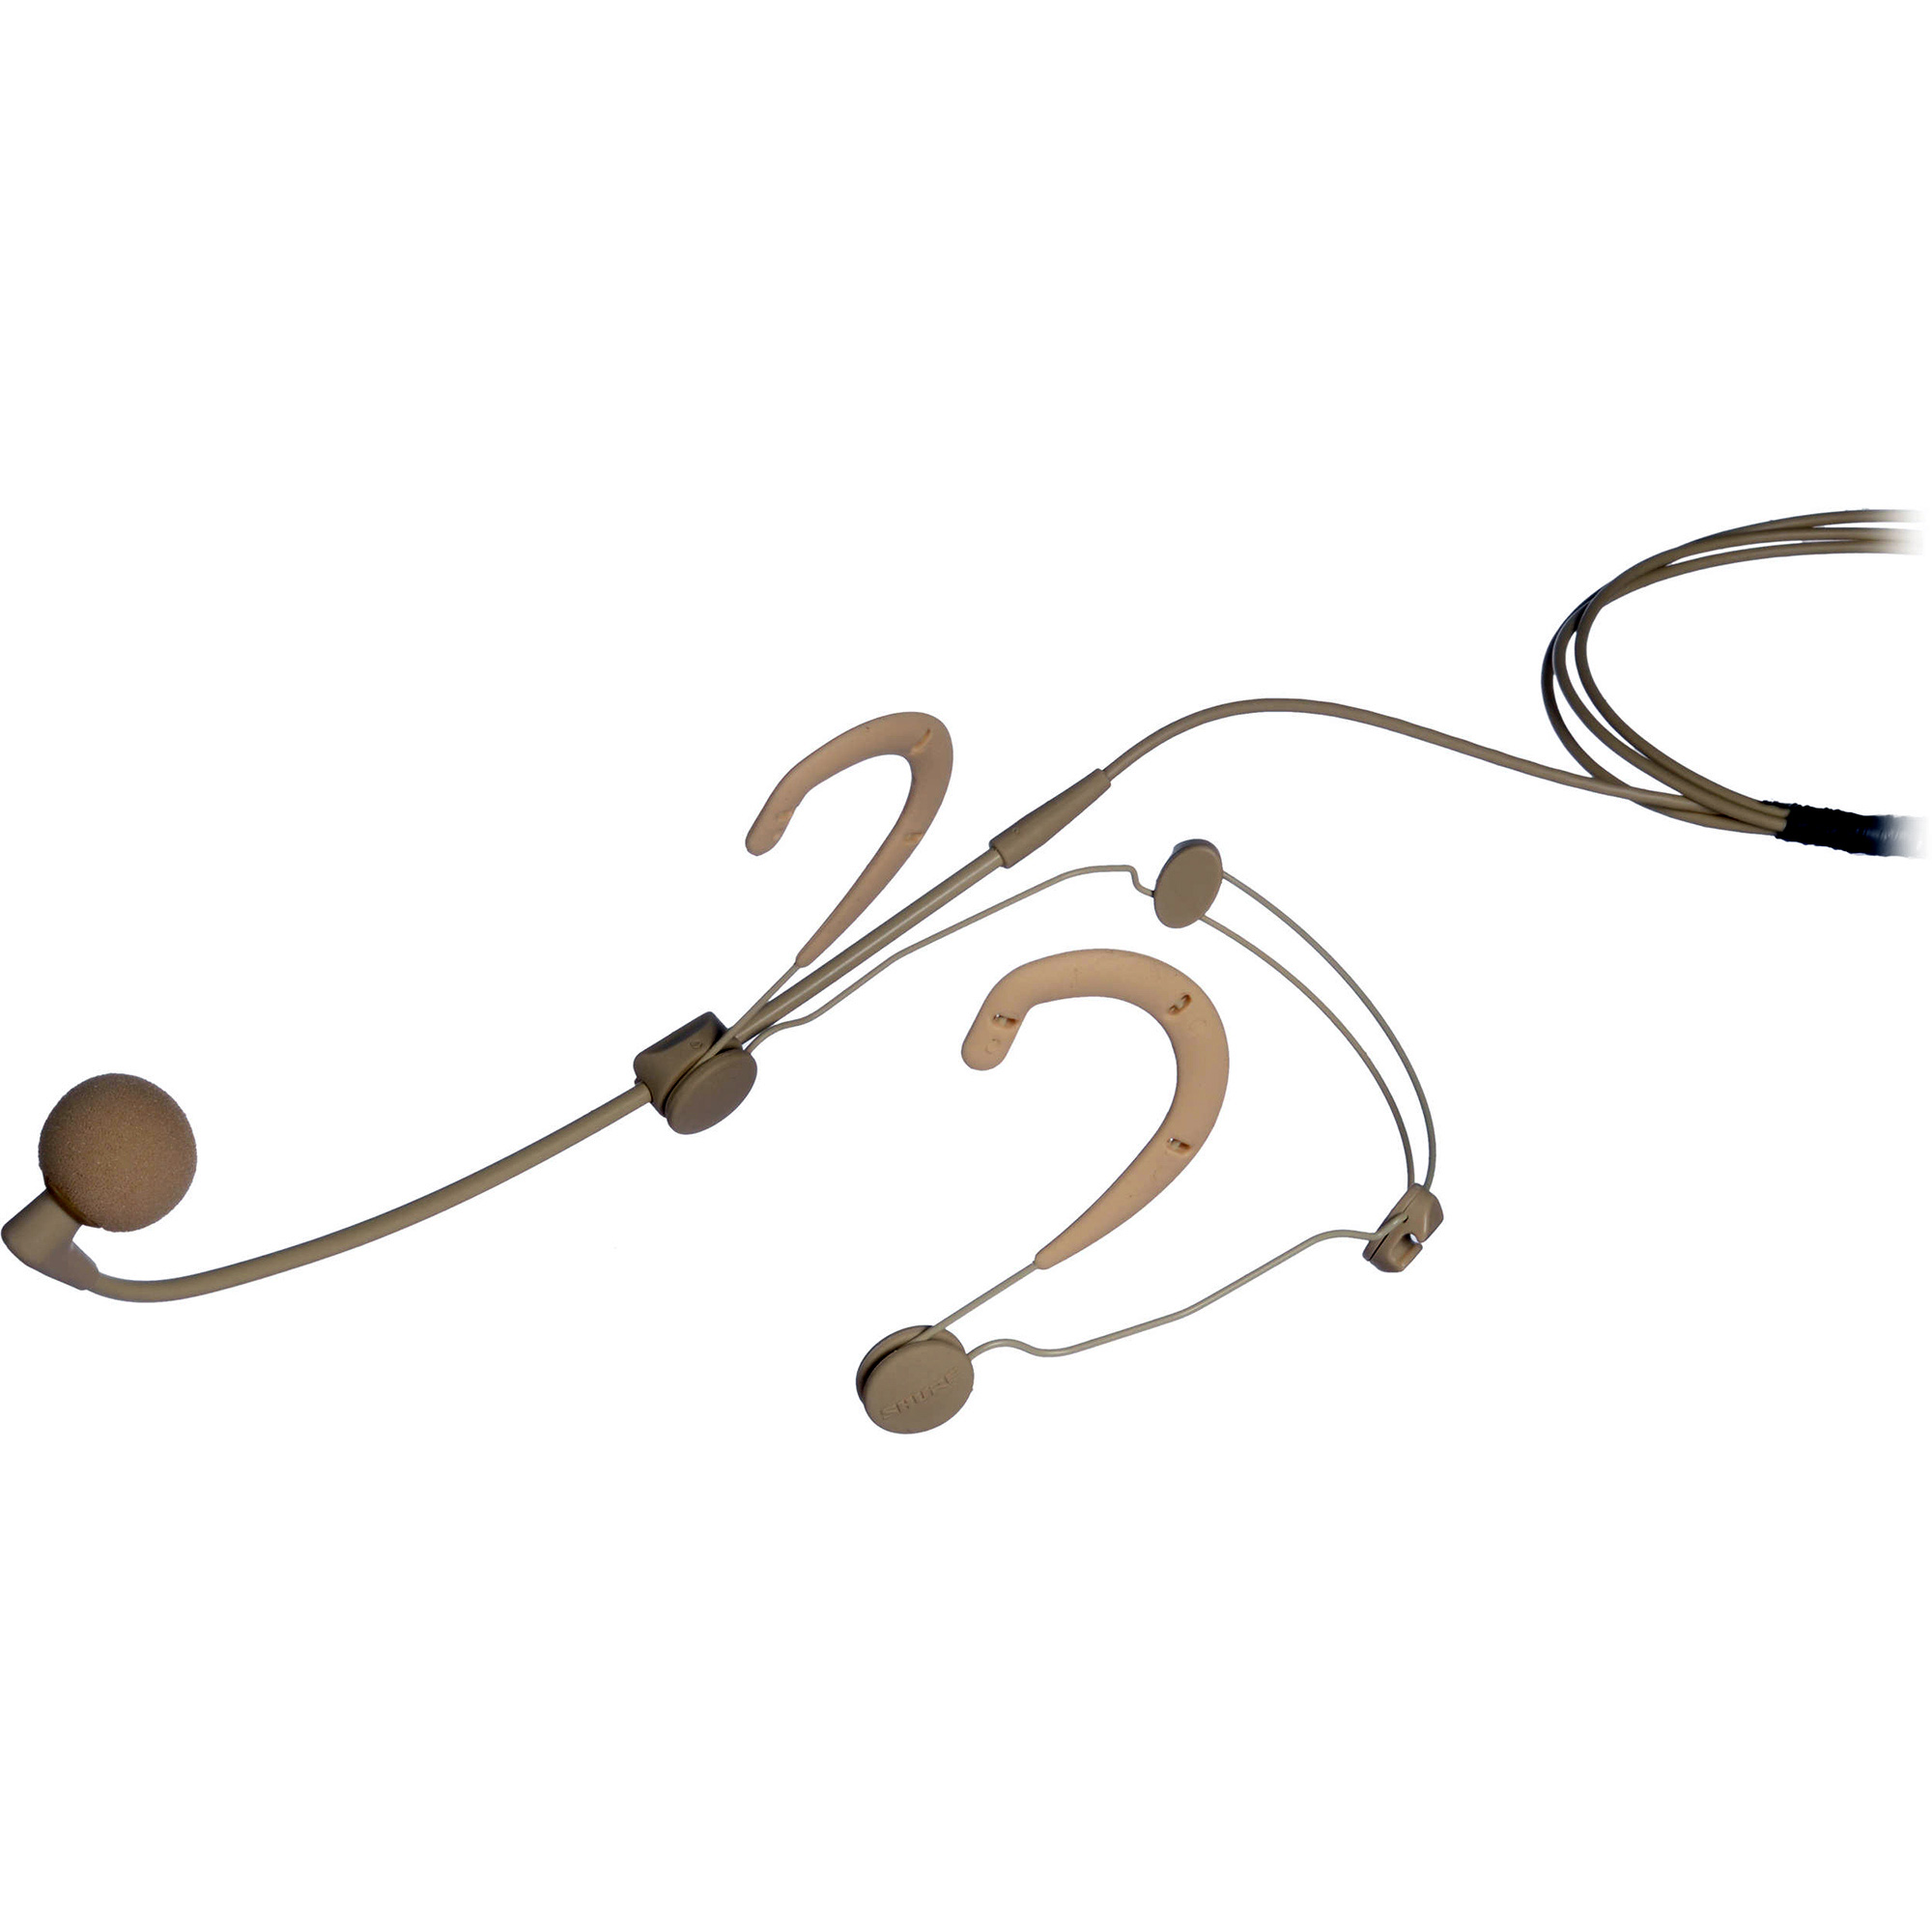 shure wbh54t beta 54 supercardioid condenser headworn microphone tan 4 pin mini connector ta4f. Black Bedroom Furniture Sets. Home Design Ideas